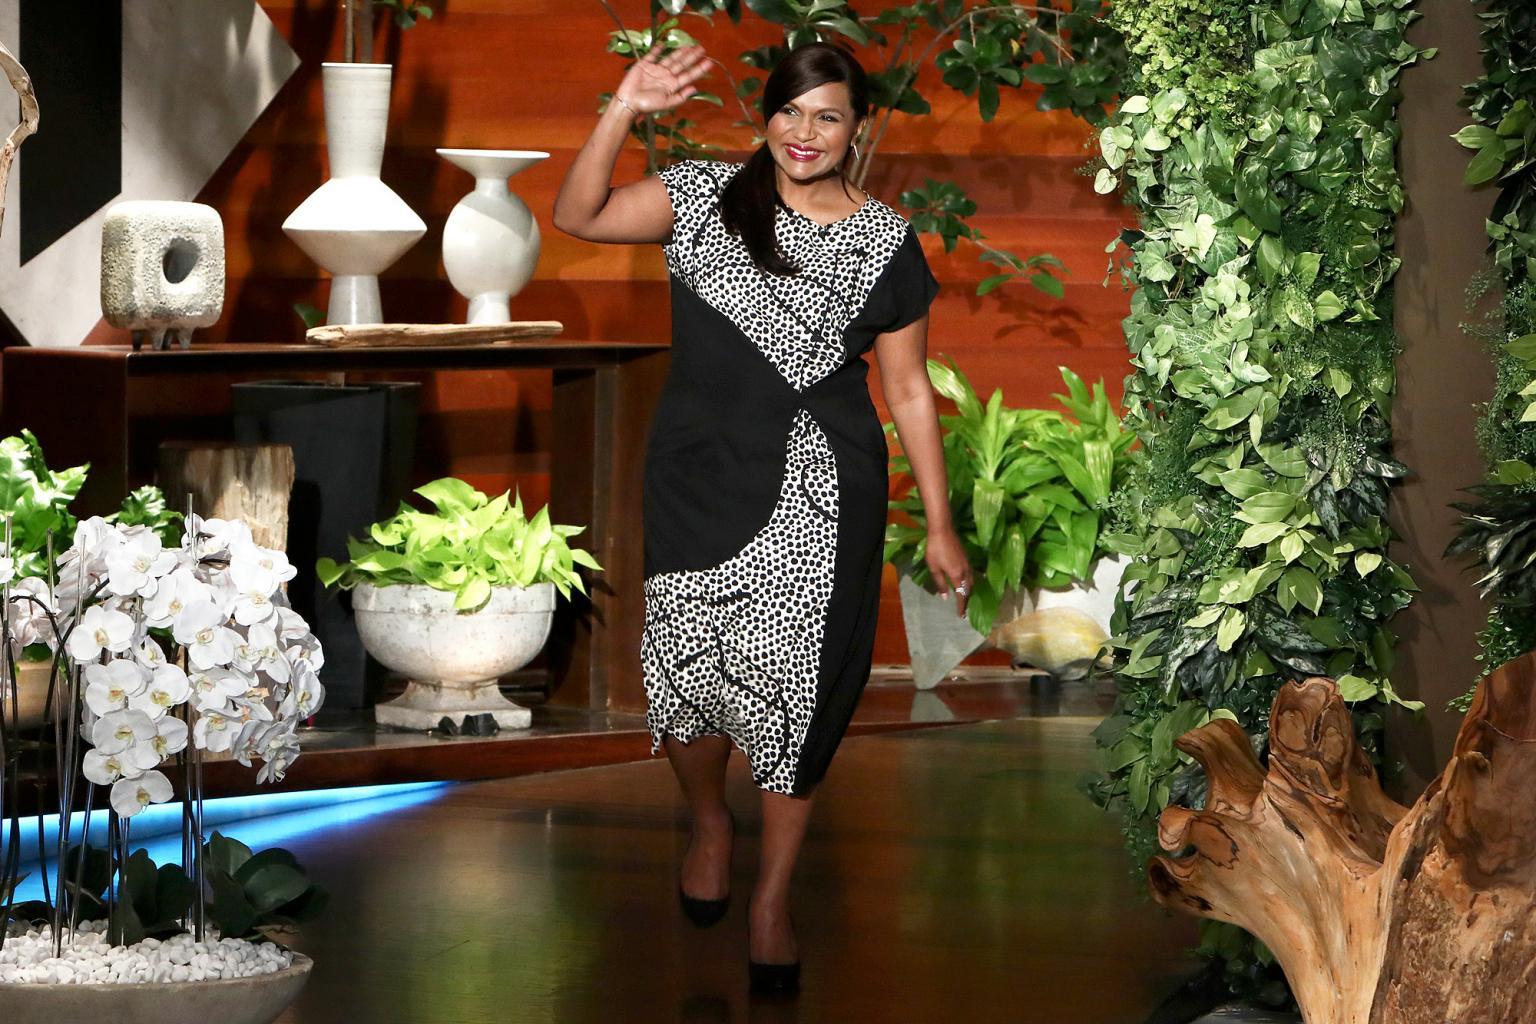 Mindy Kaling Confirms She's Having a Baby Girl & Talks Oprah Winfrey Spilling the Pregnancy Beans